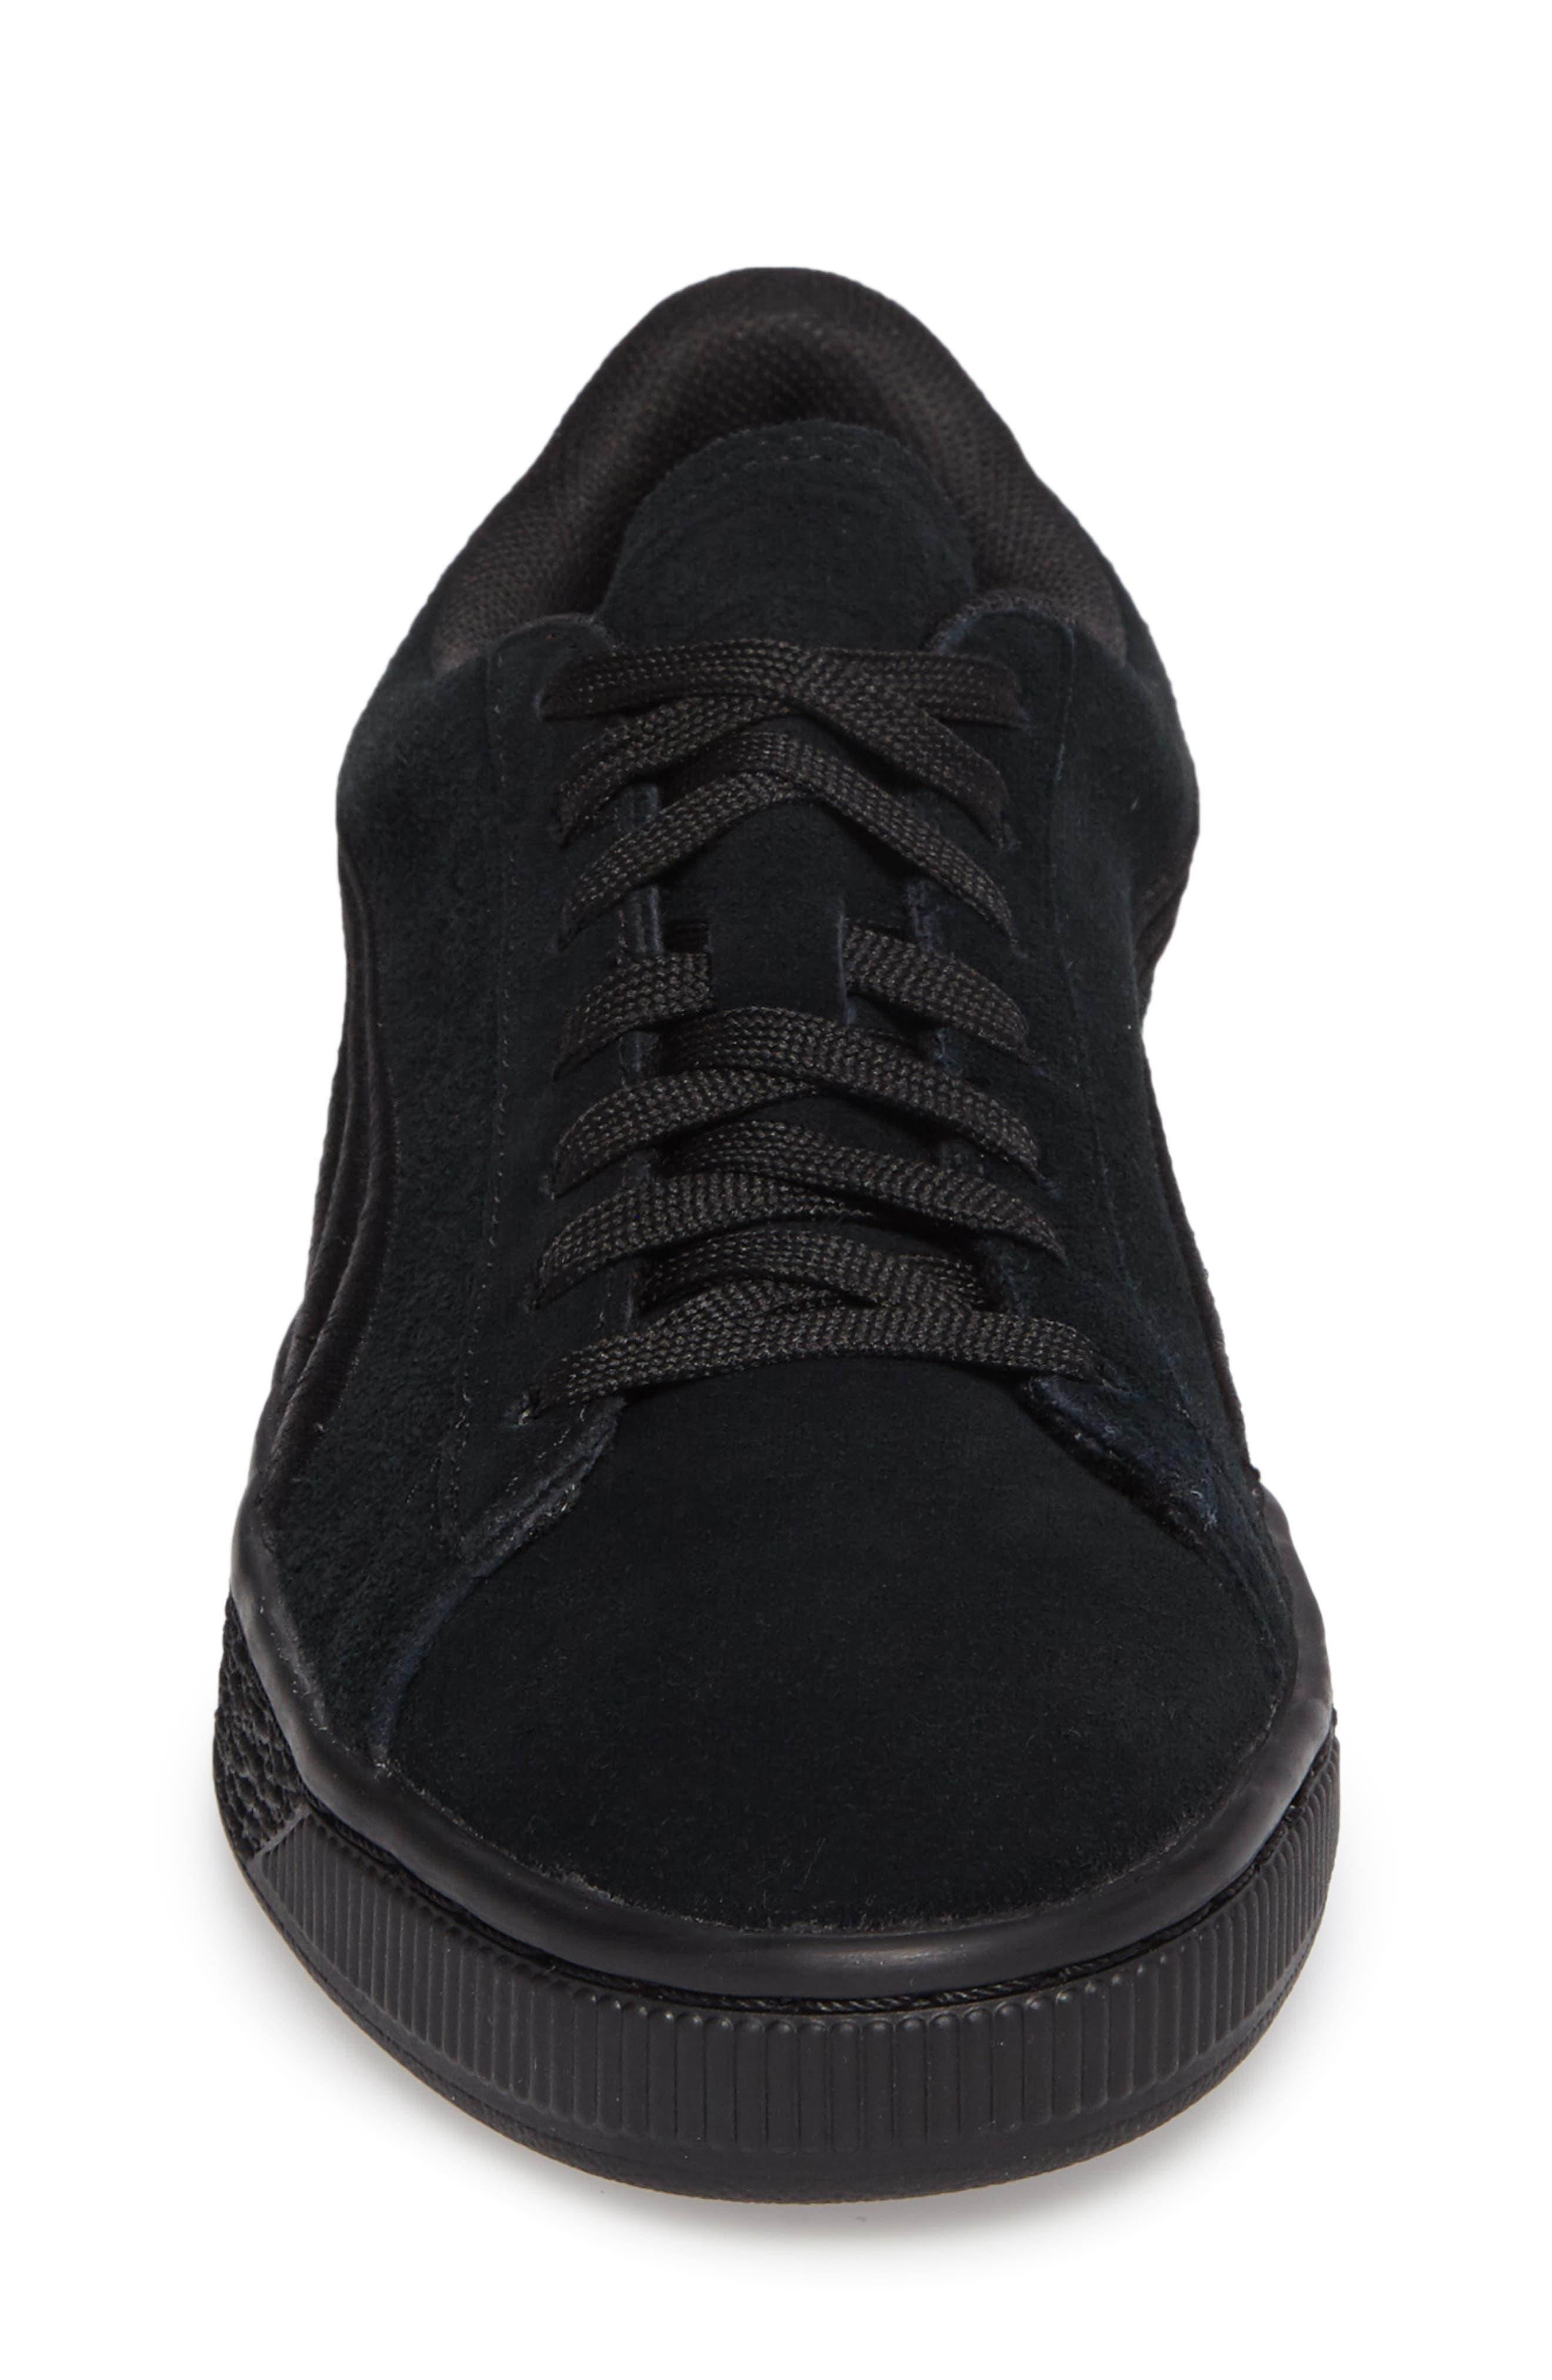 Suede Classic Badge Jr. Sneaker,                             Alternate thumbnail 4, color,                             Black/ Black